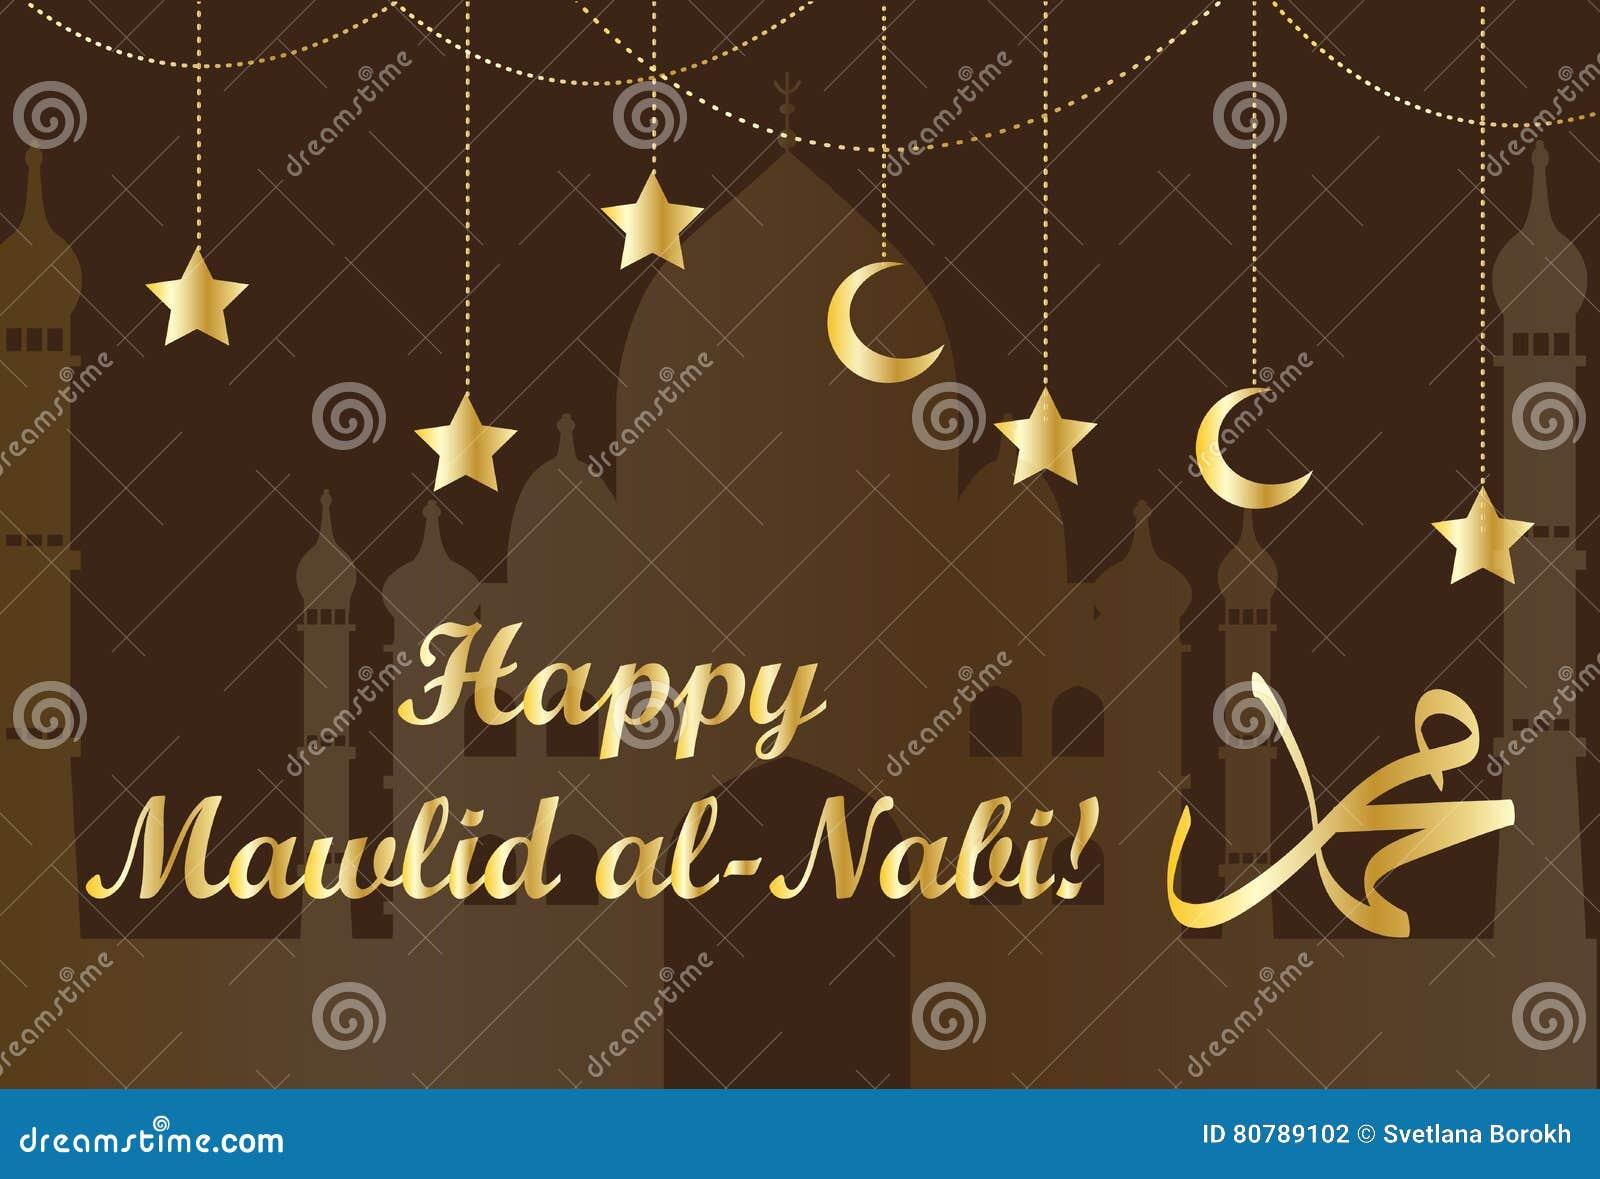 Mawlid Al Nabi The Birthday Of The Prophet Muhammad Greeting Card